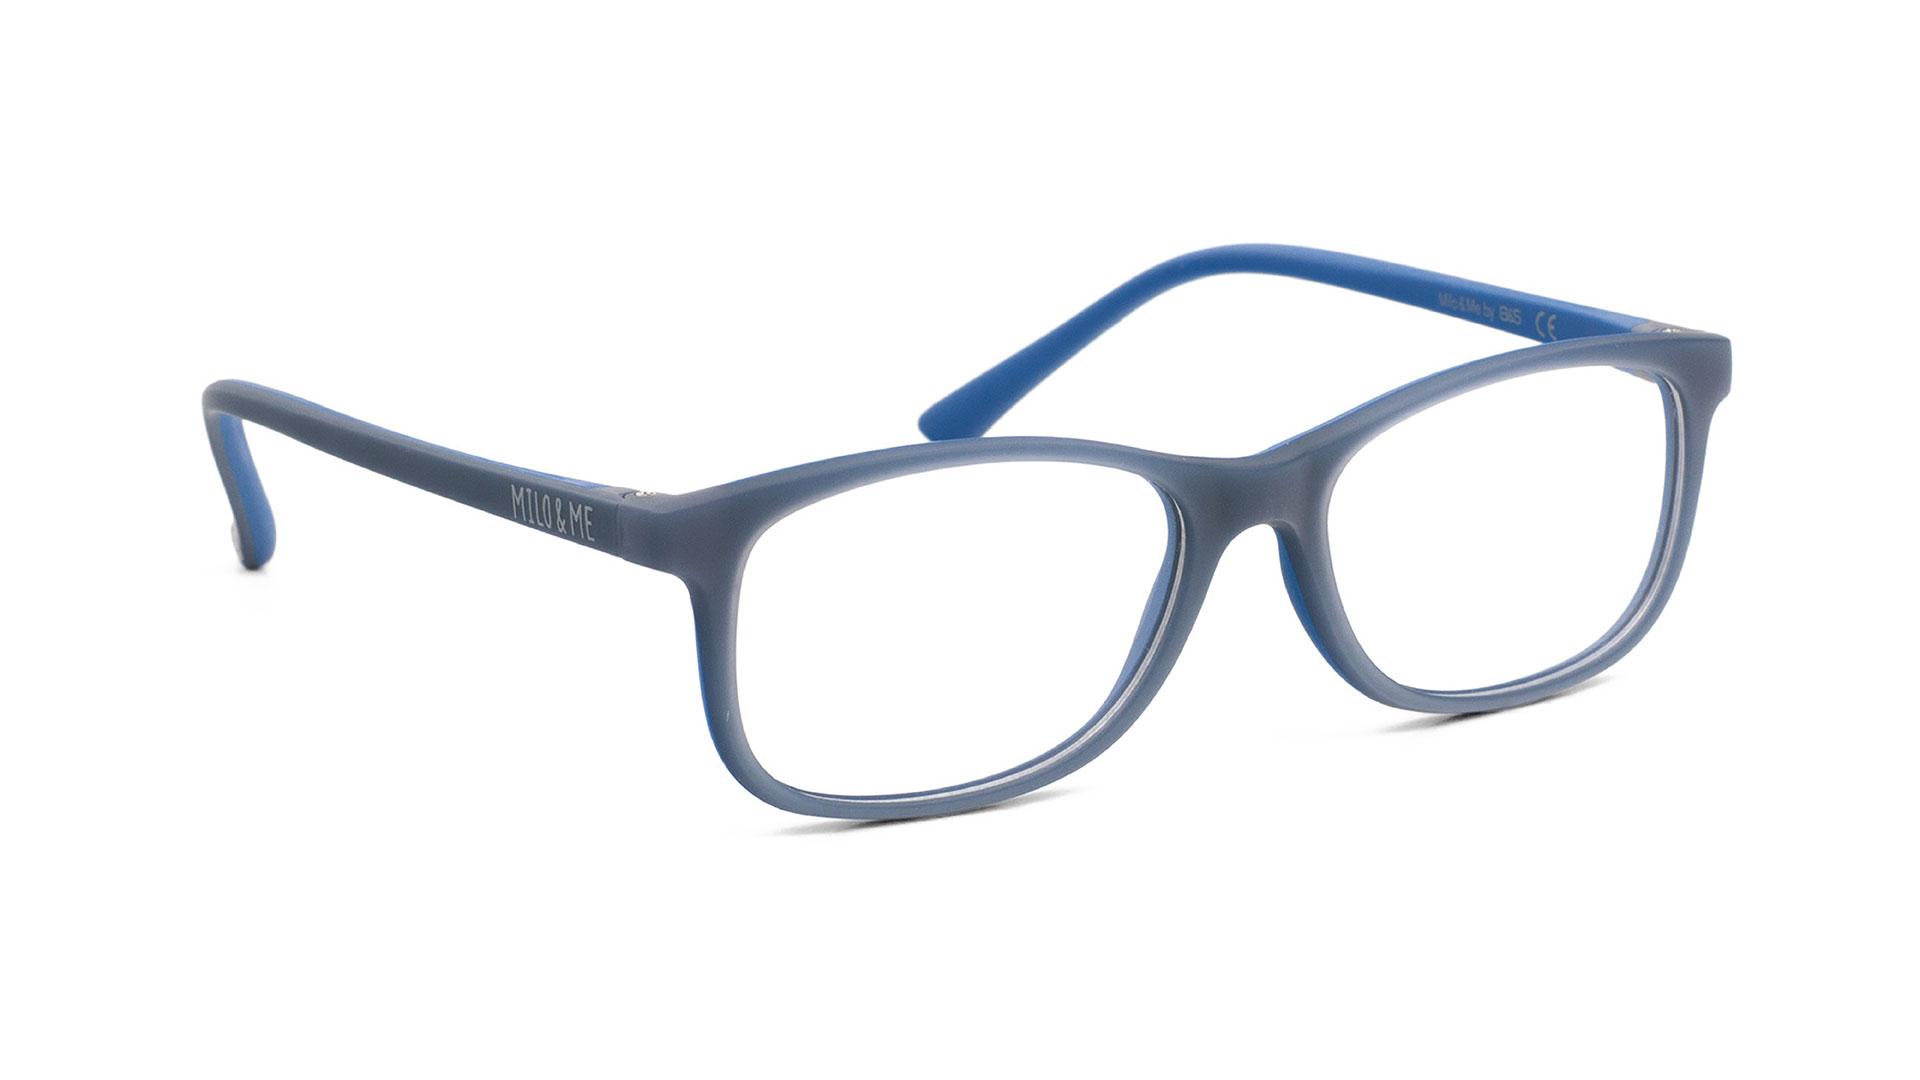 Grey Blue Blue H85041-20 - Milo & Me Eyewear - Optimum RX Lens Specialists